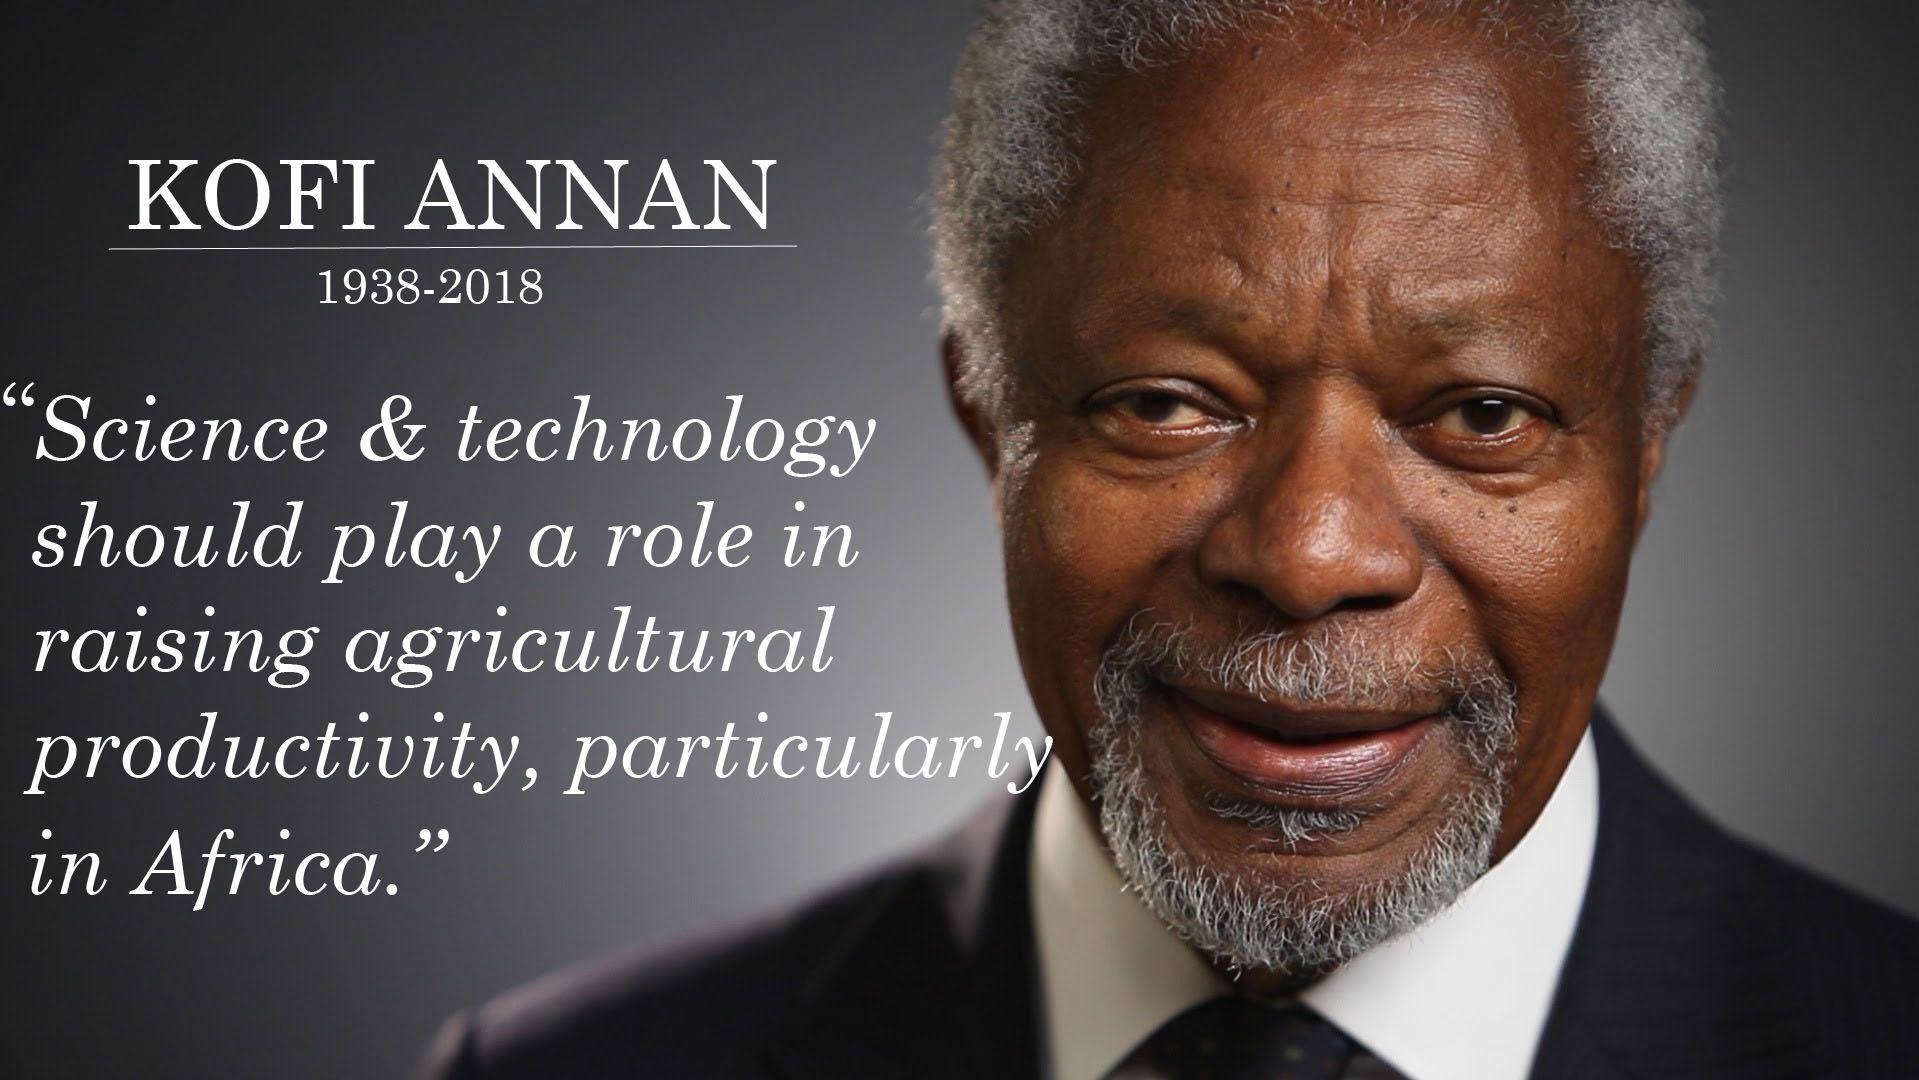 AfriCenter's tribute to Kofi Annan